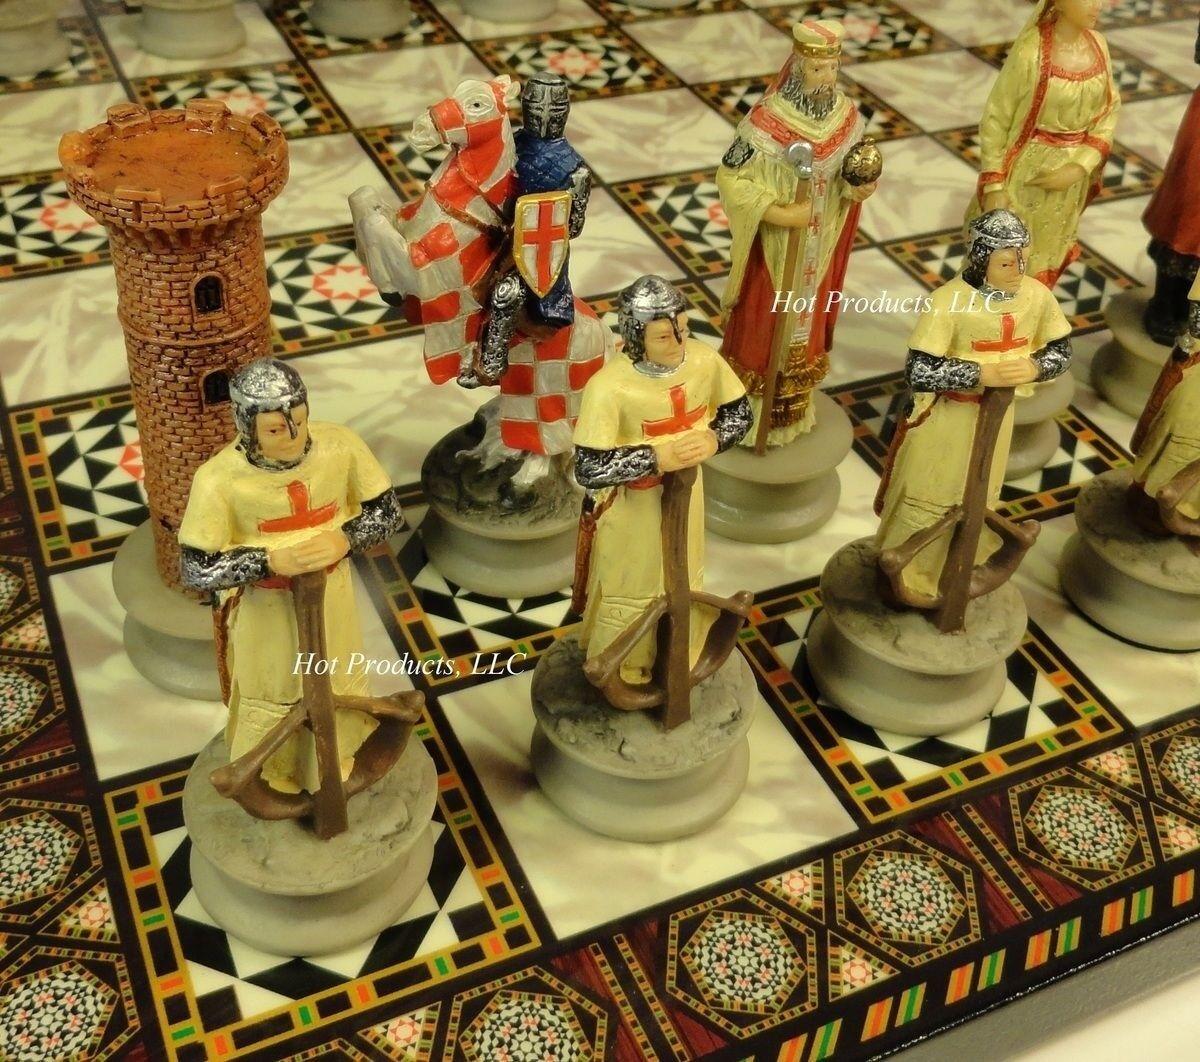 MEDIEVAL TIMES CRUSADES Arabian Vs Christian CHESS SET W MOSAIC DESIGN BOARD 14